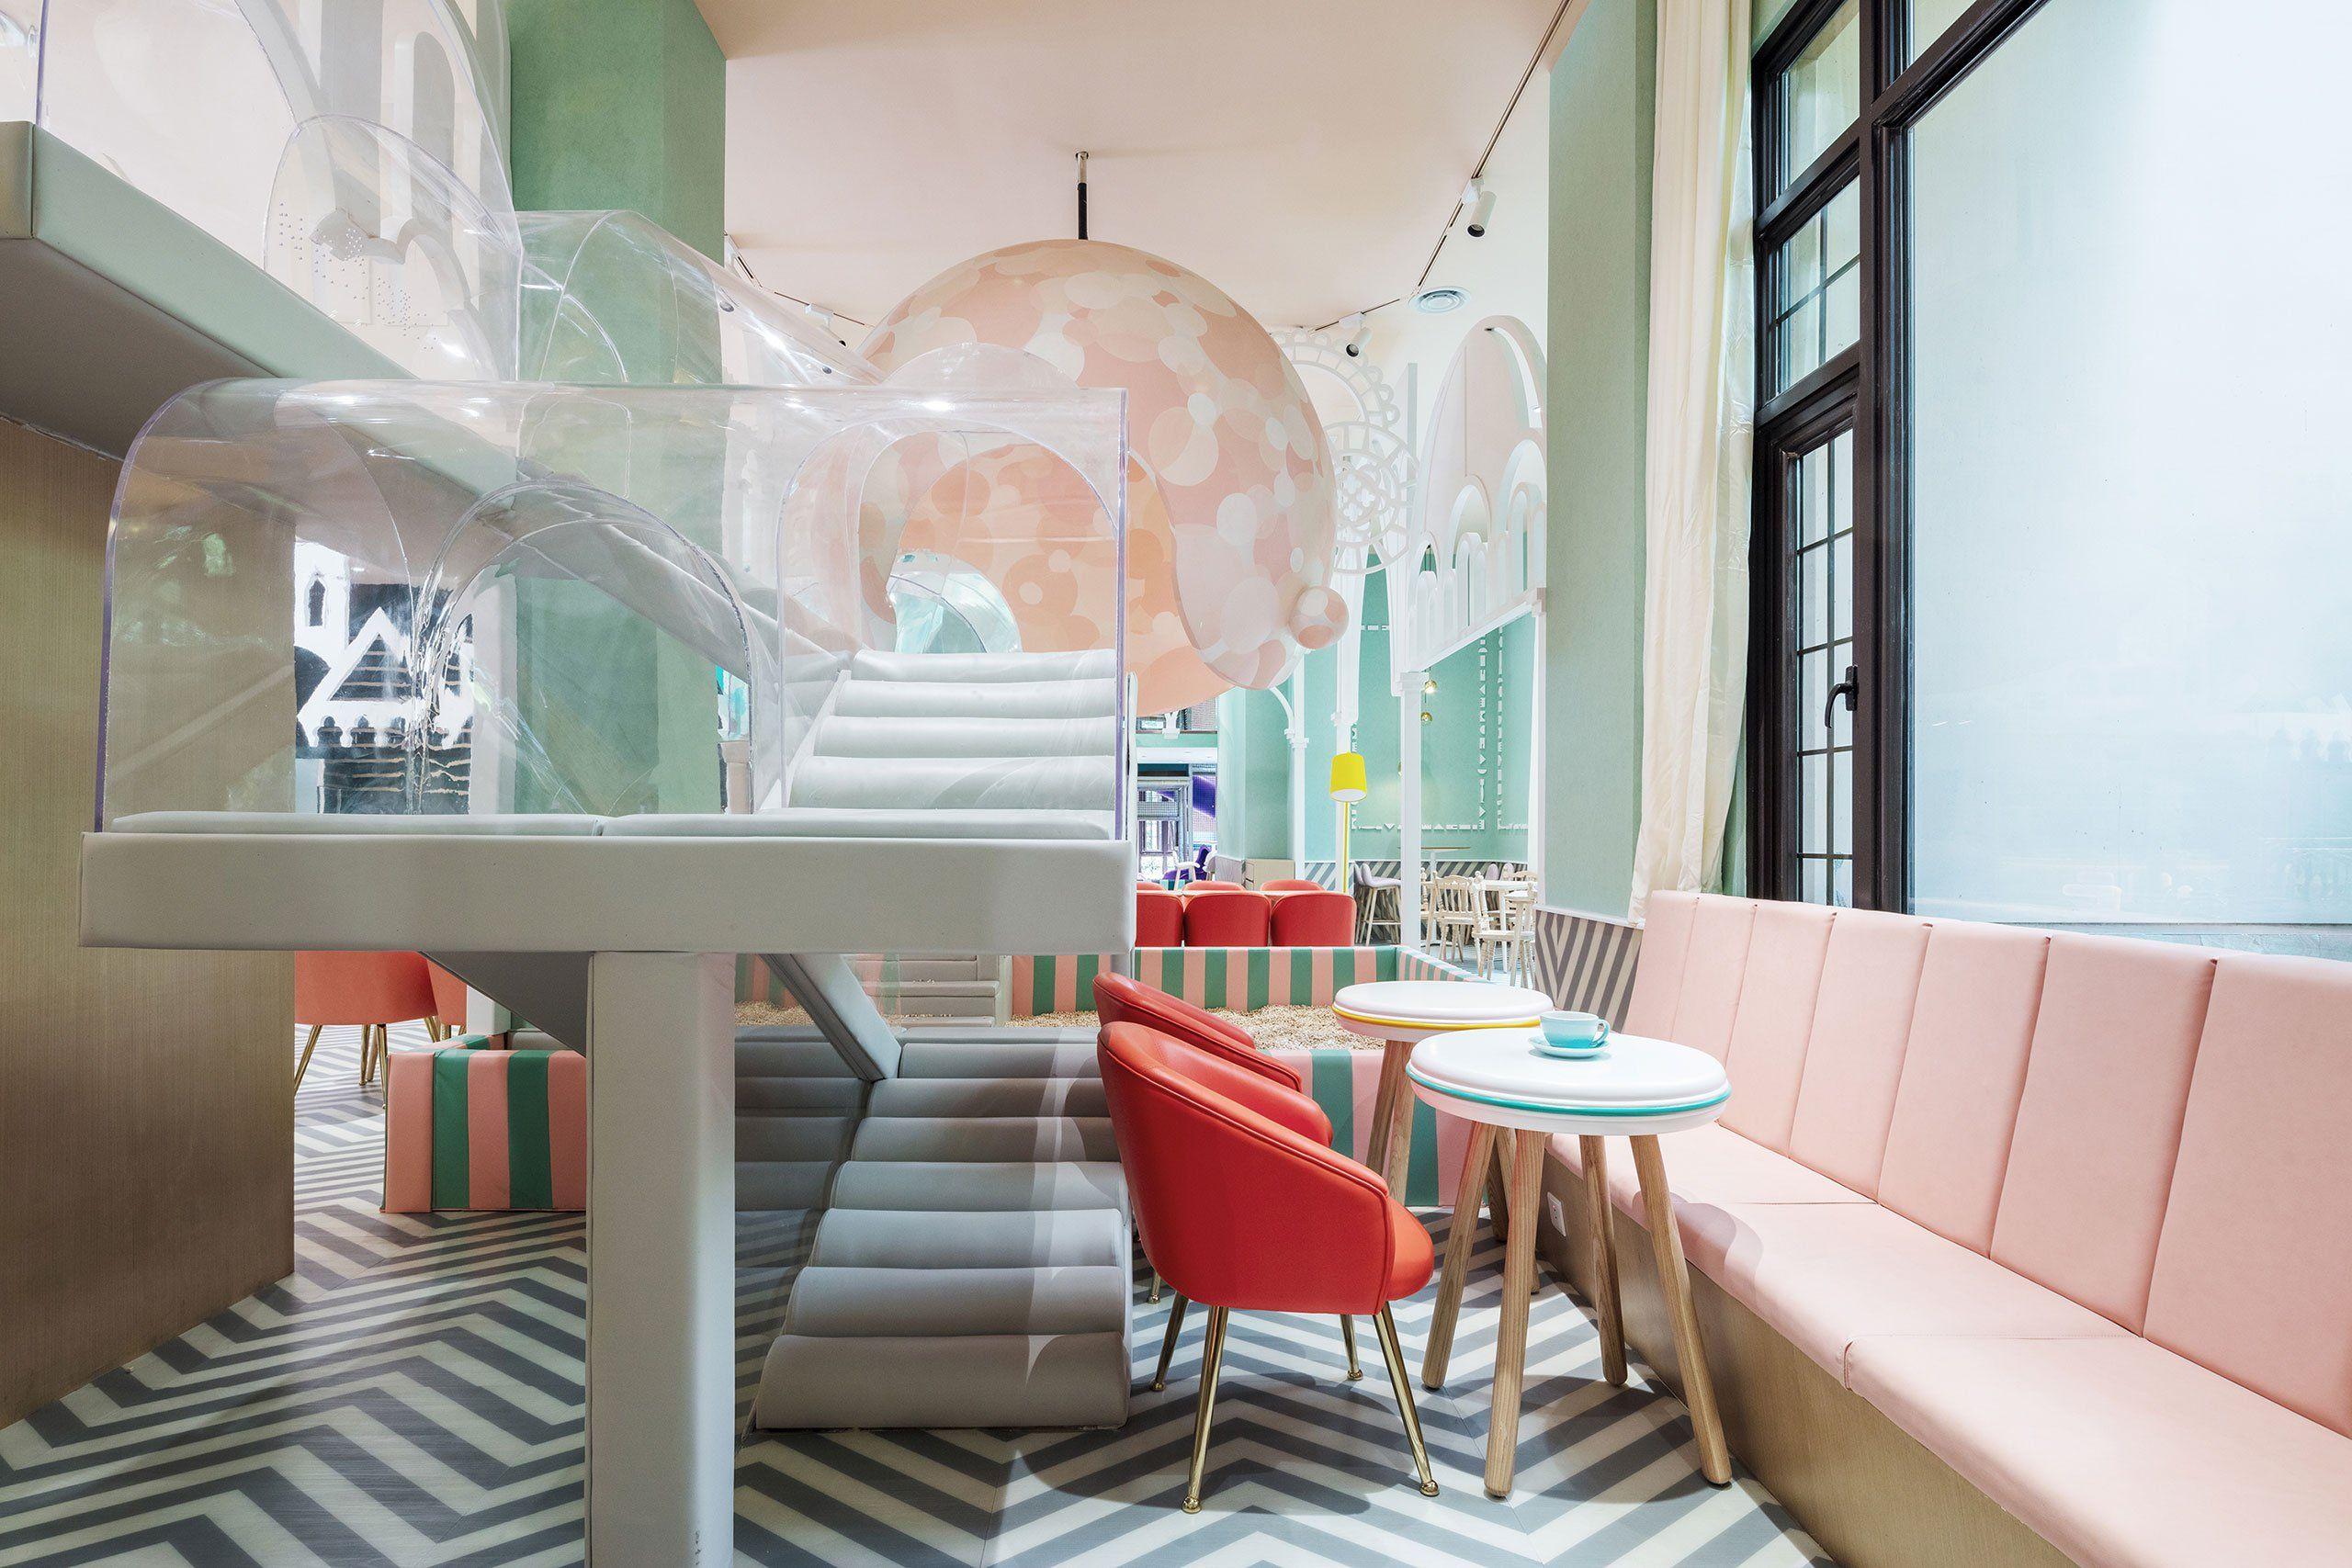 A Childu0027s Imagination Turned Destination At Shanghaiu0027s Neobio Restaurant